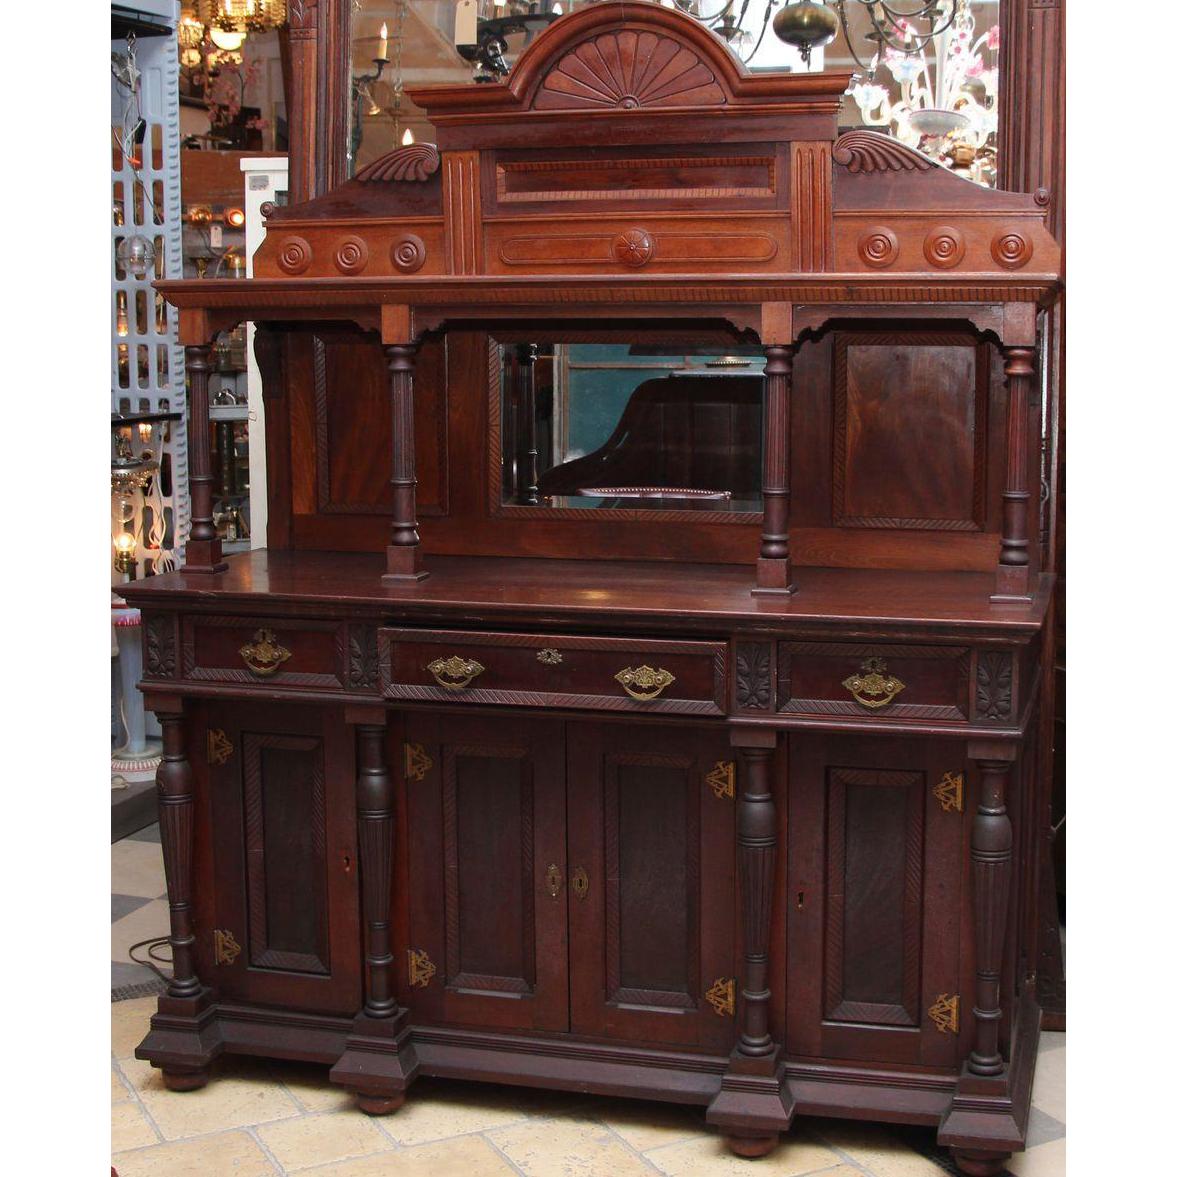 Elegant carved Eastlake sideboard